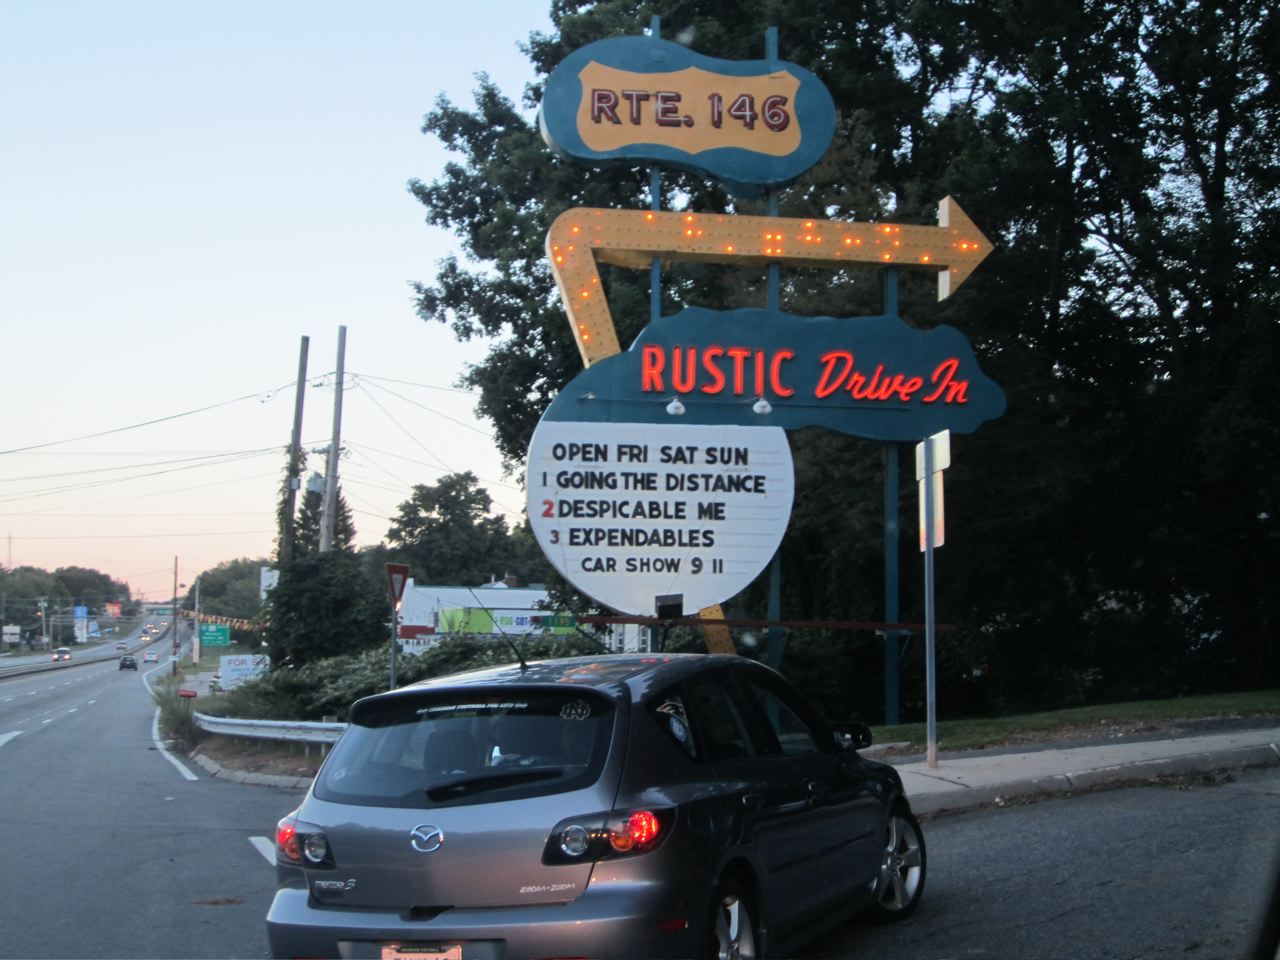 Drive In Movie Theater Rhode Island